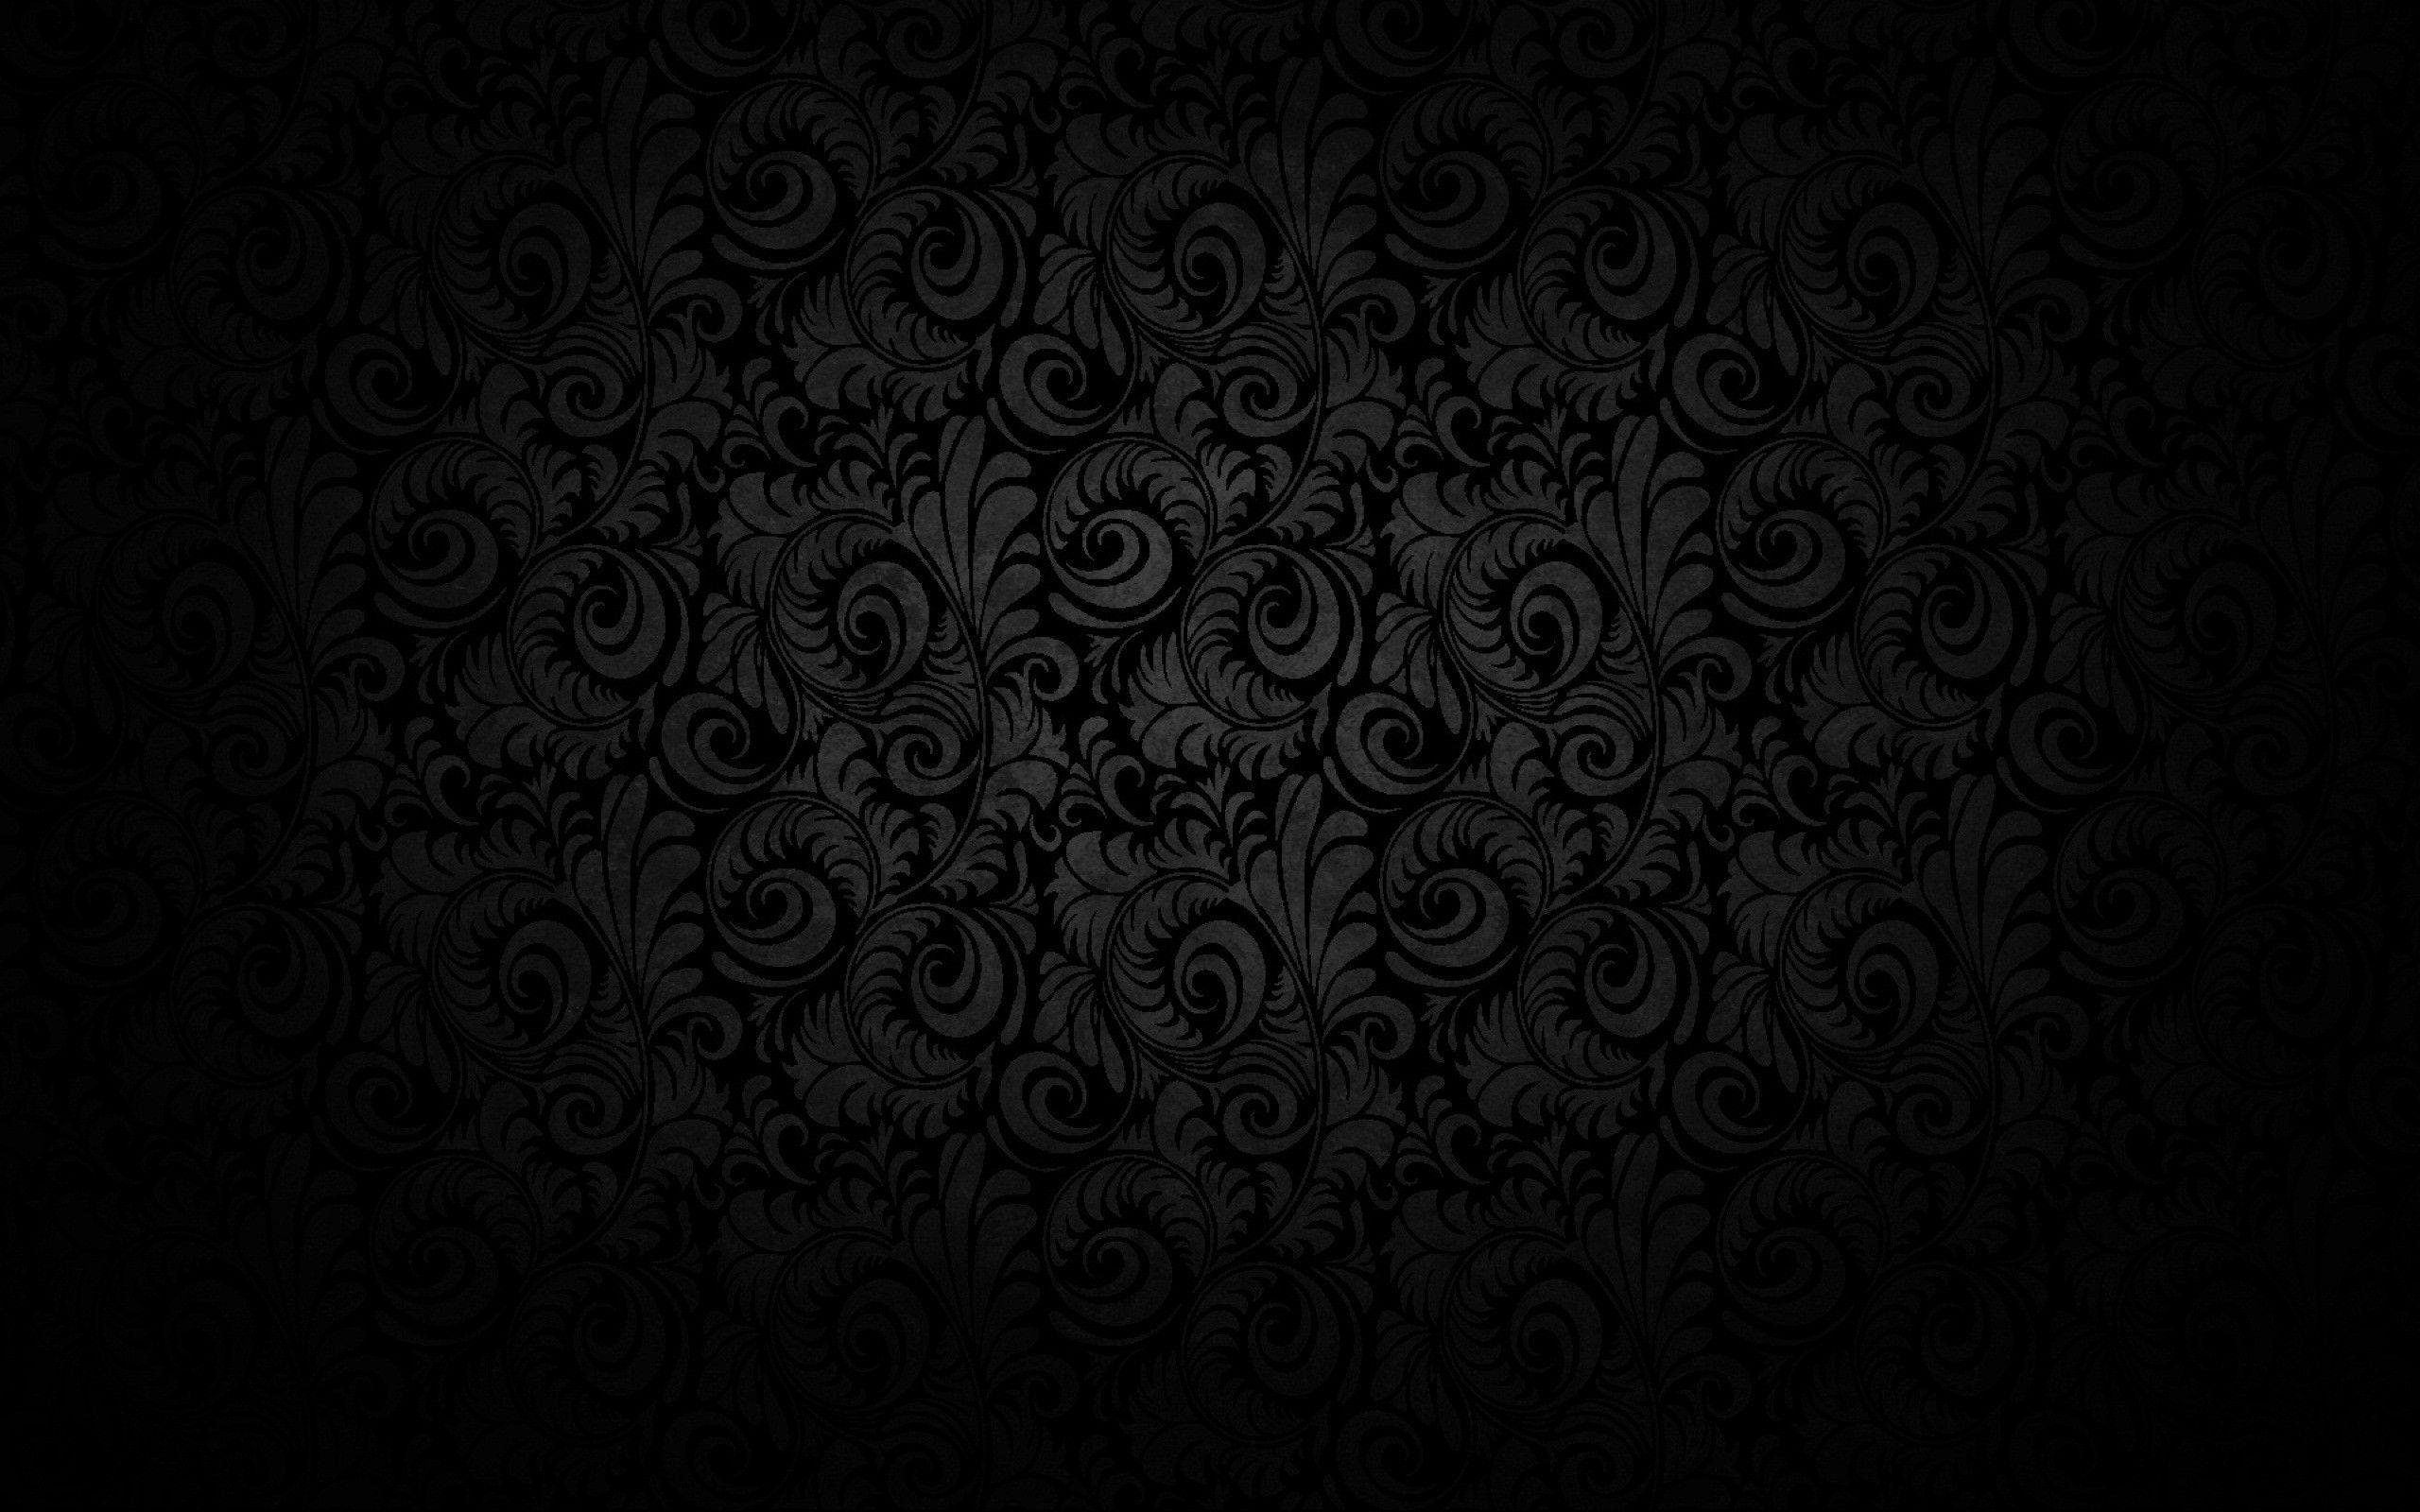 Black Vector Wallpapers - Top Free Black Vector Backgrounds -  WallpaperAccess